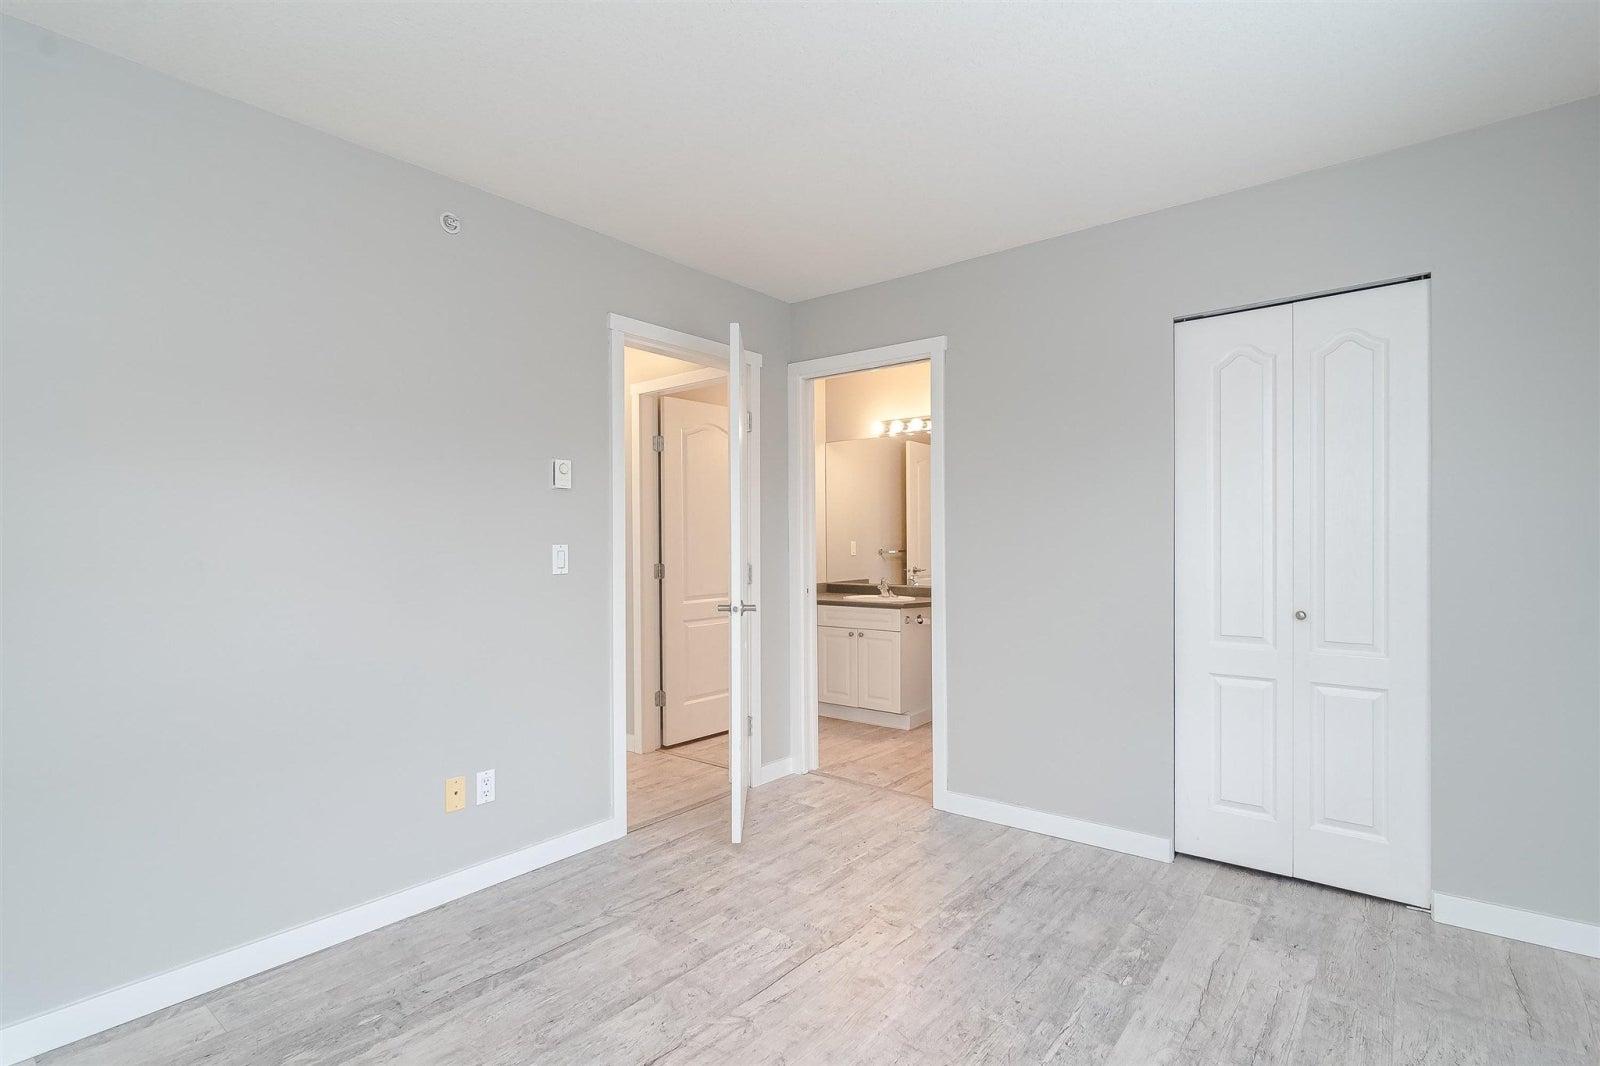 405 20268 54 AVENUE - Langley City Apartment/Condo for sale, 2 Bedrooms (R2604183) #15